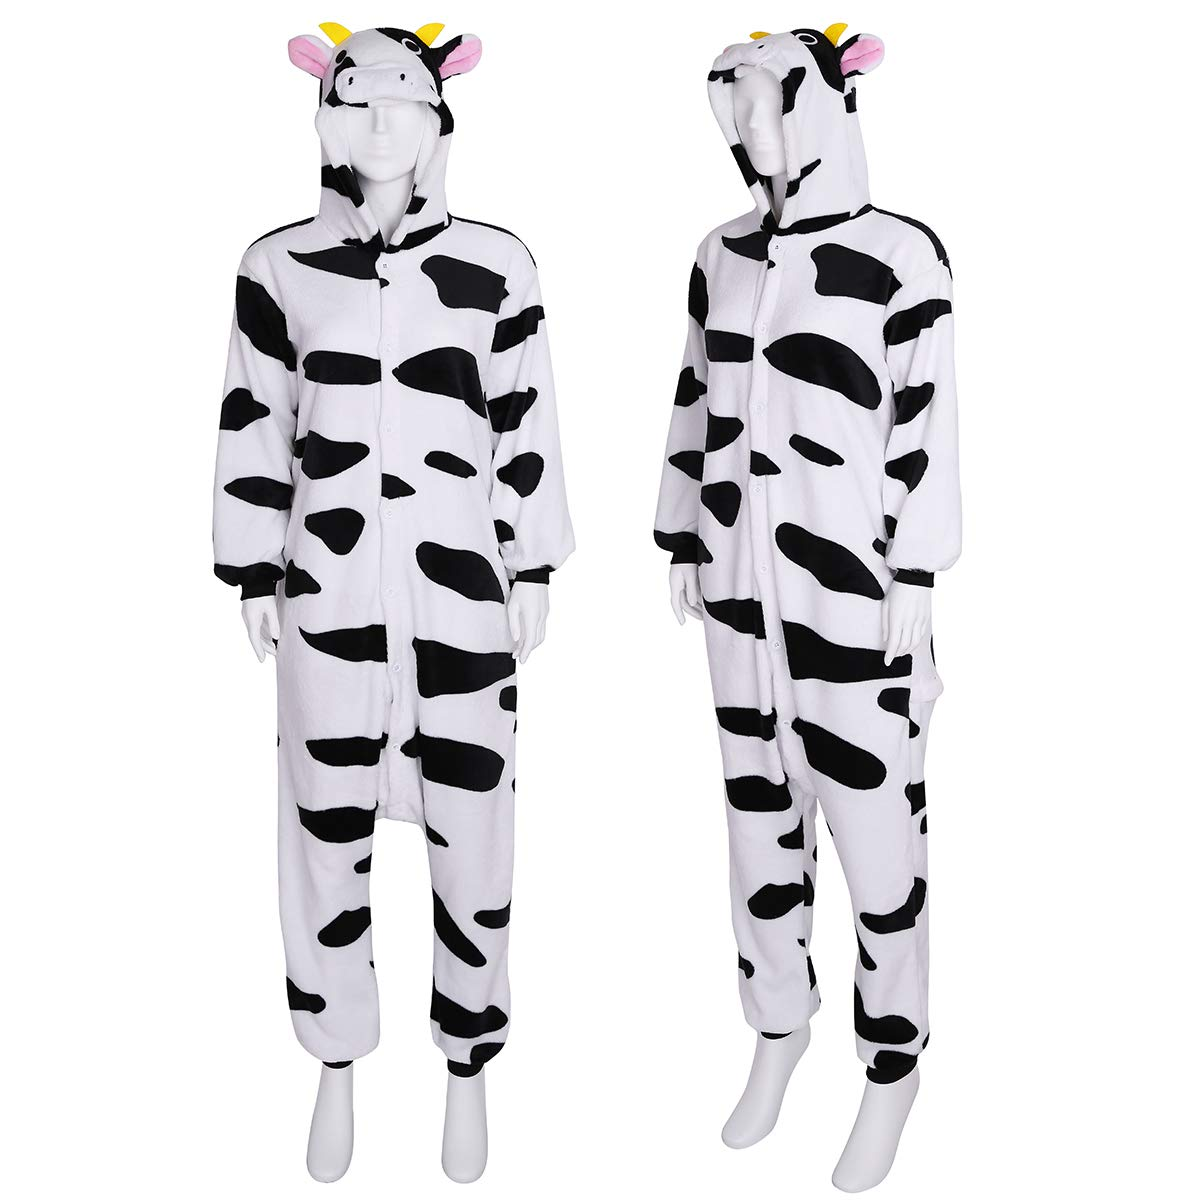 f217ca1598 dPois Pijama Vaca Forro Polar Franela Mujer Hombre Mono Animal Unisex  Adulto Lenceria con Capucha Cálido Peluche Body Ropa de Dormir Noche  Disfraz Cosplay ...